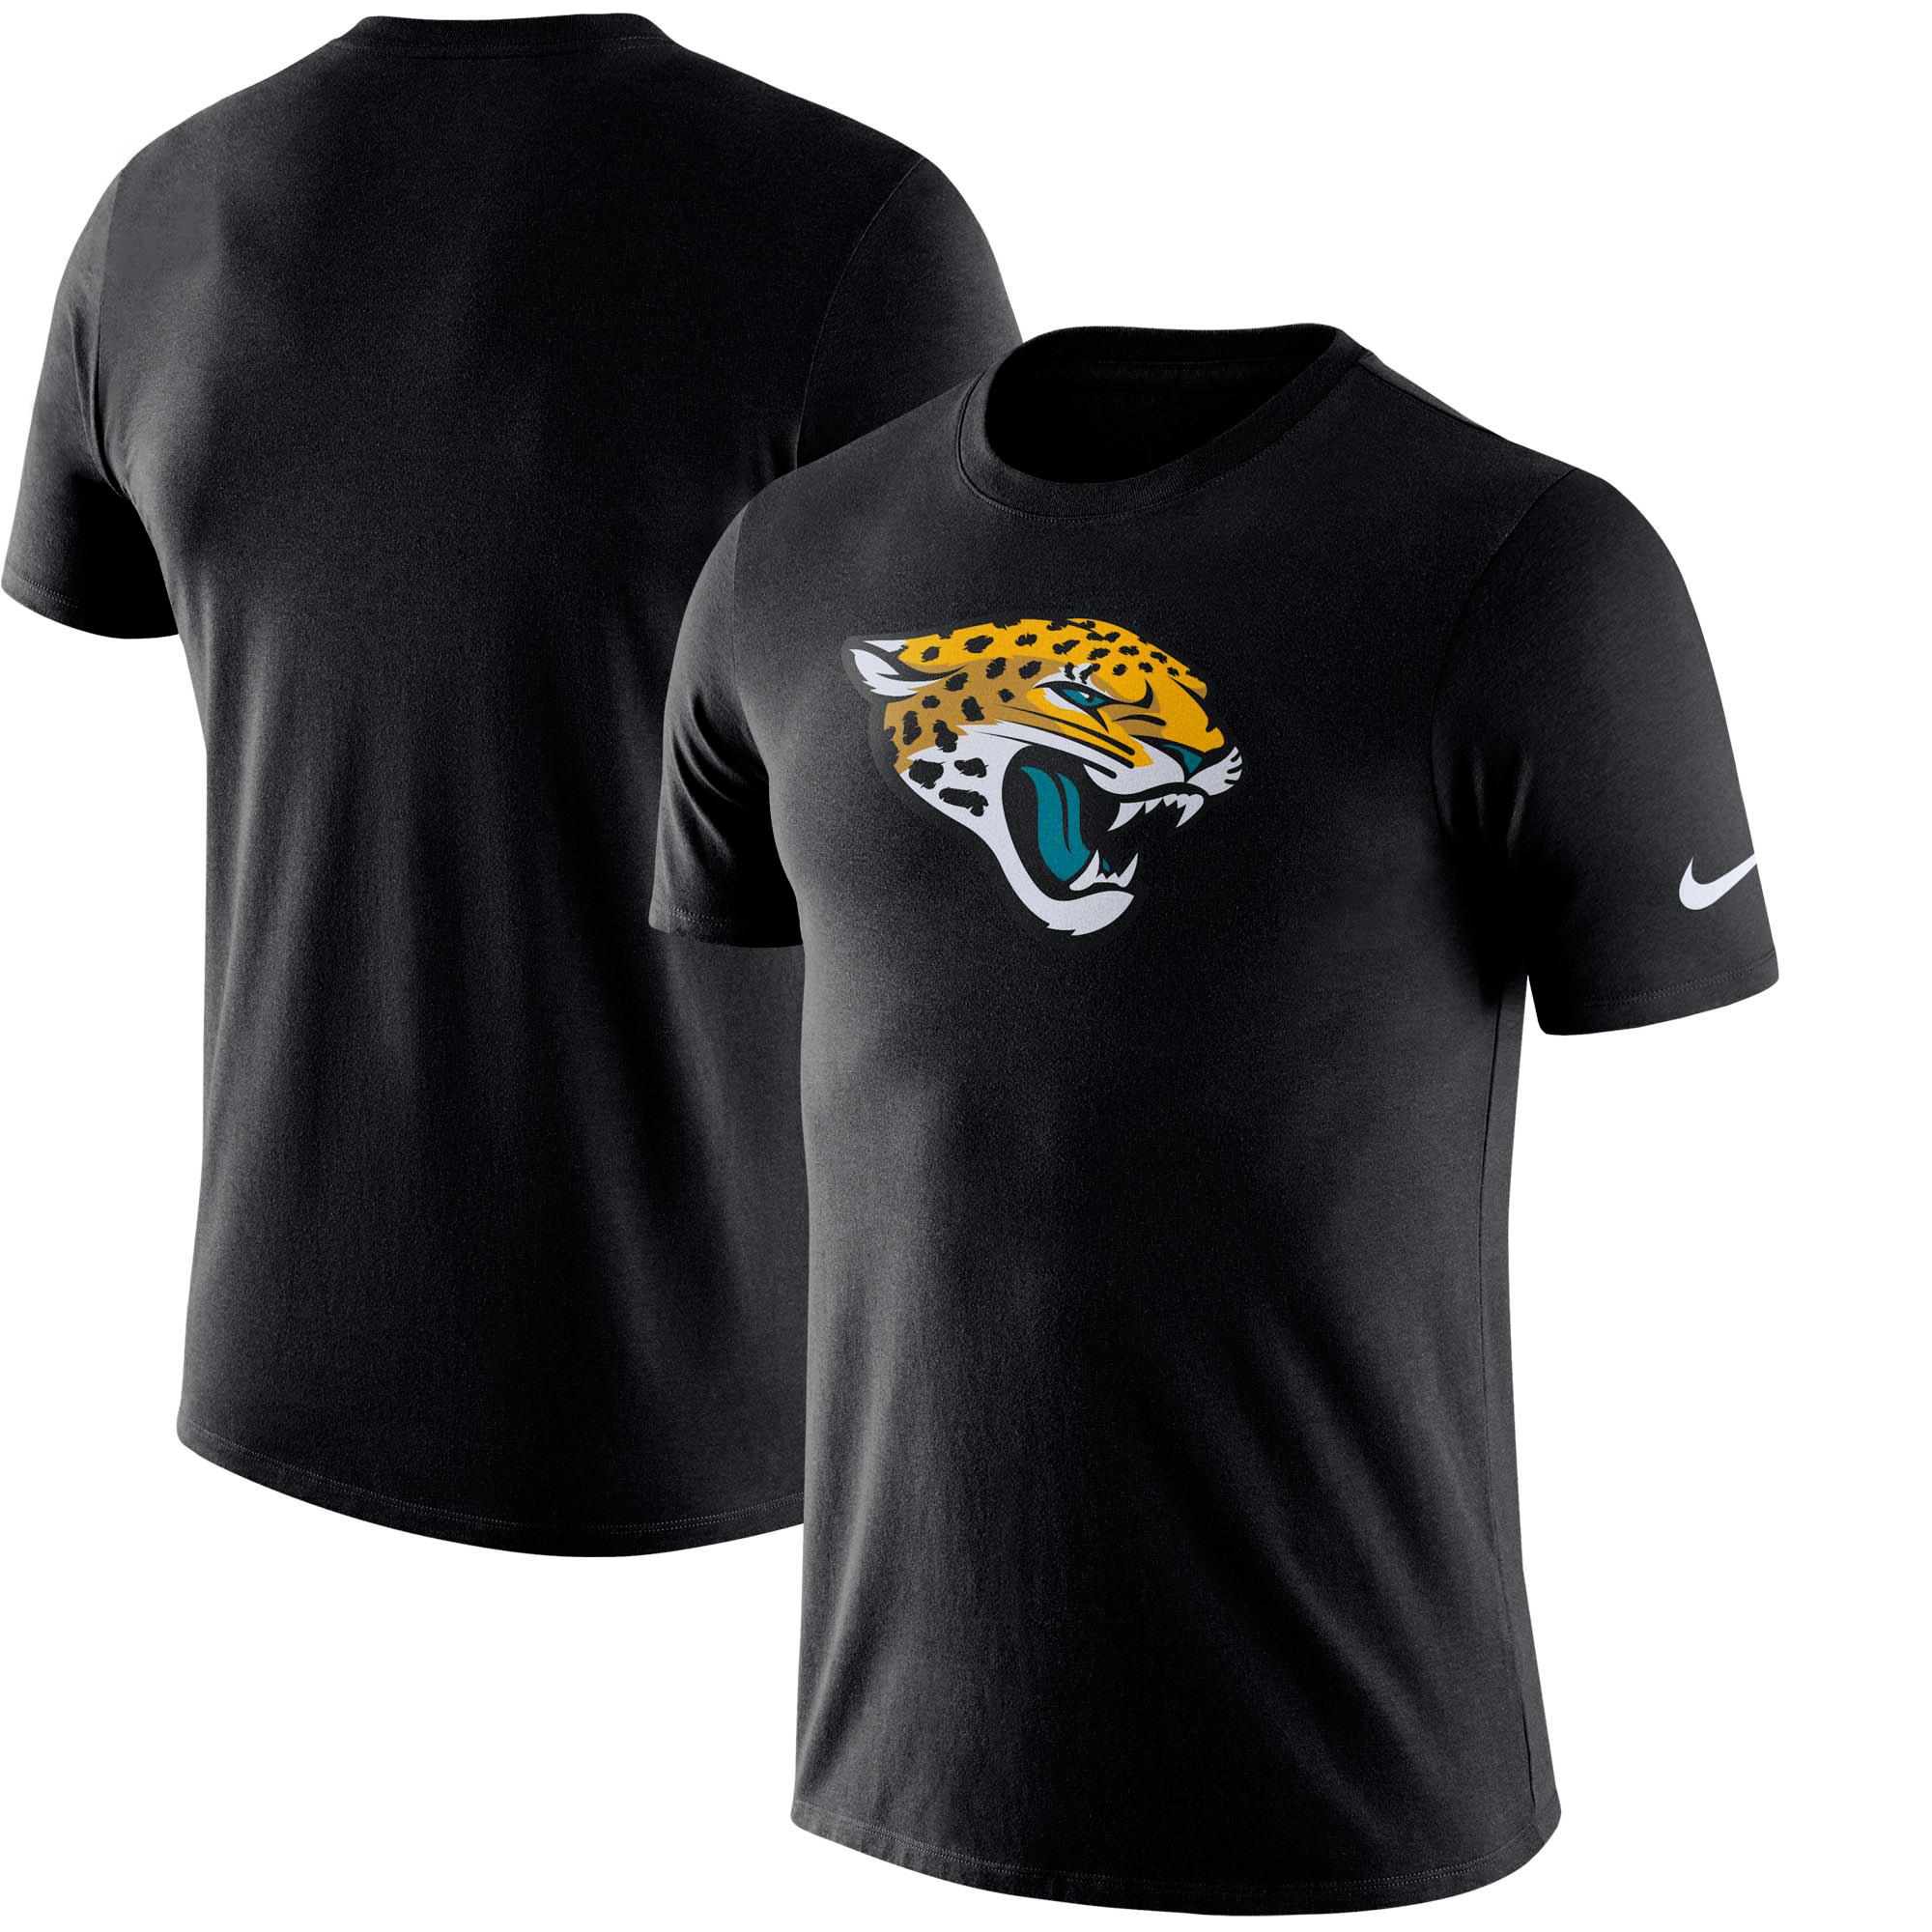 Jacksonville Jaguars Nike Essential Logo Performance T-Shirt - Black